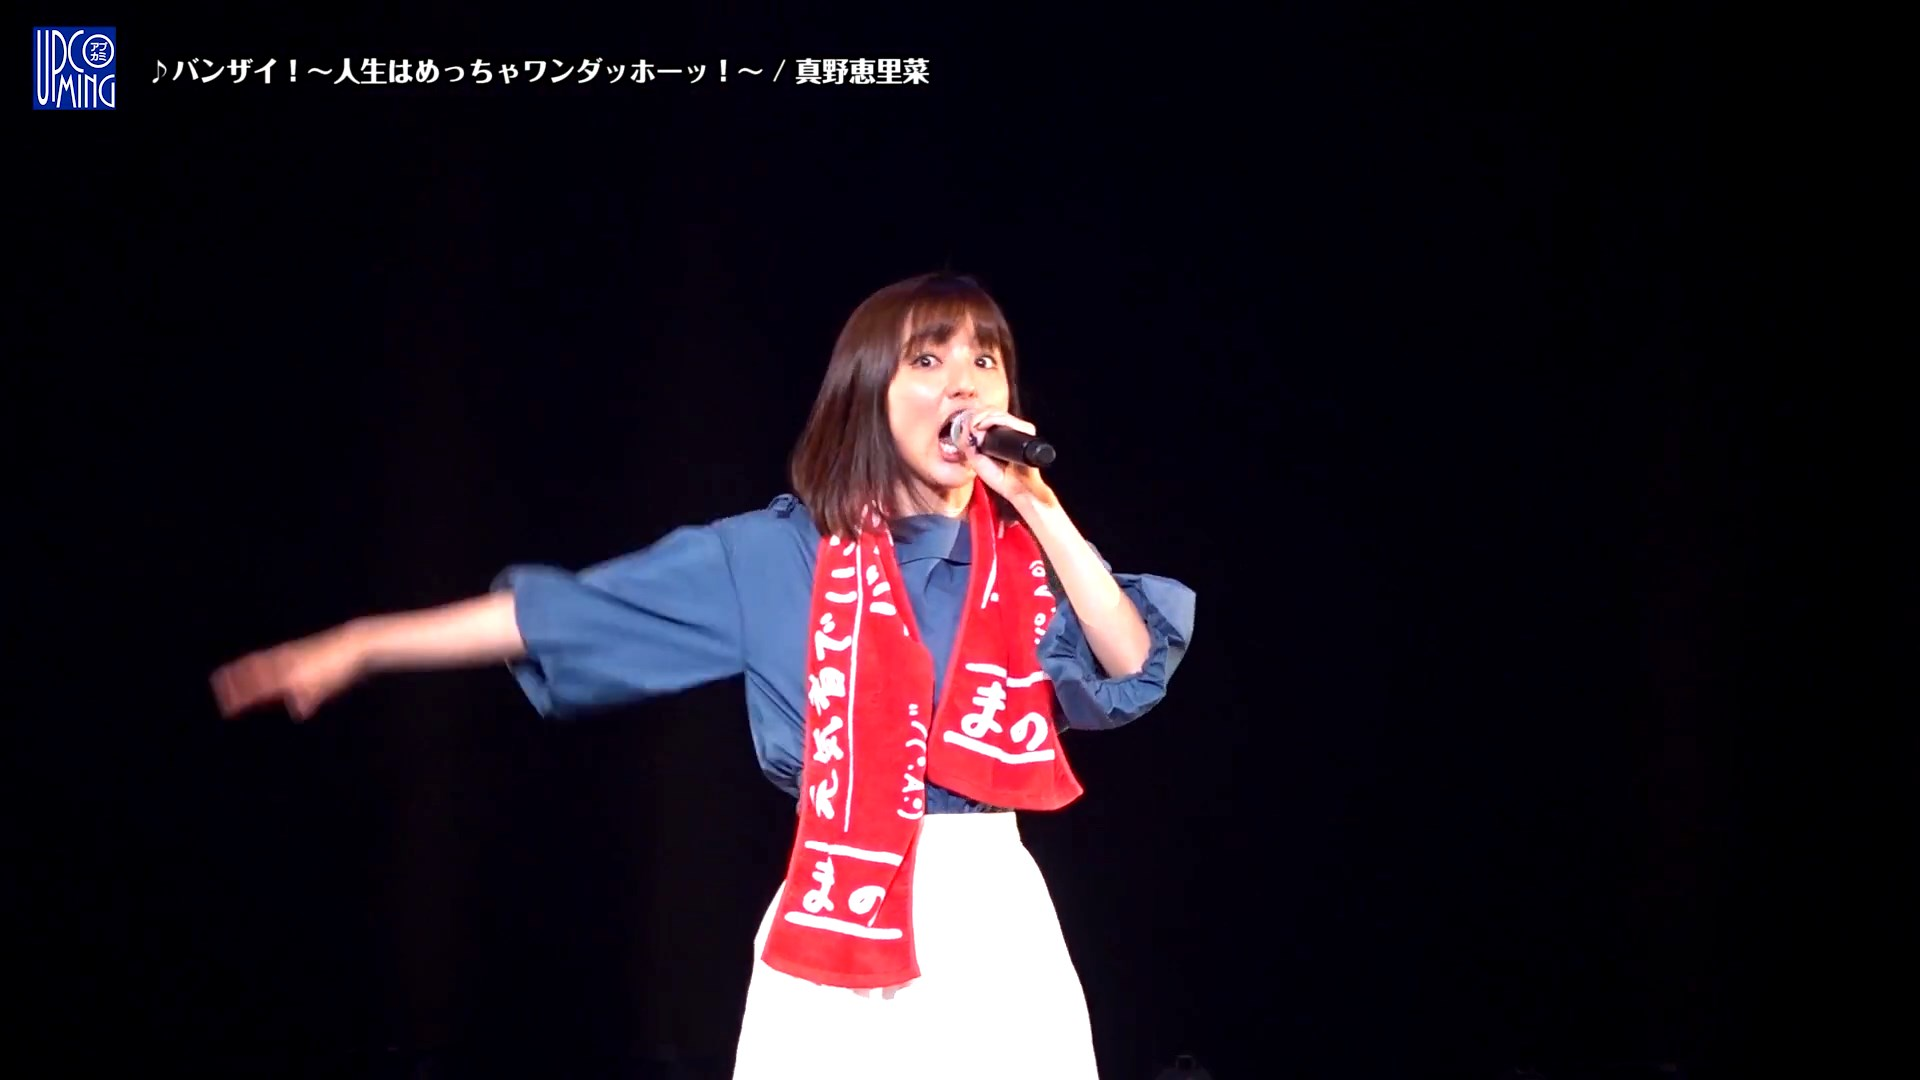 Mano_Erina_Banzai_Jinsei_wa_Meccha_Wonde